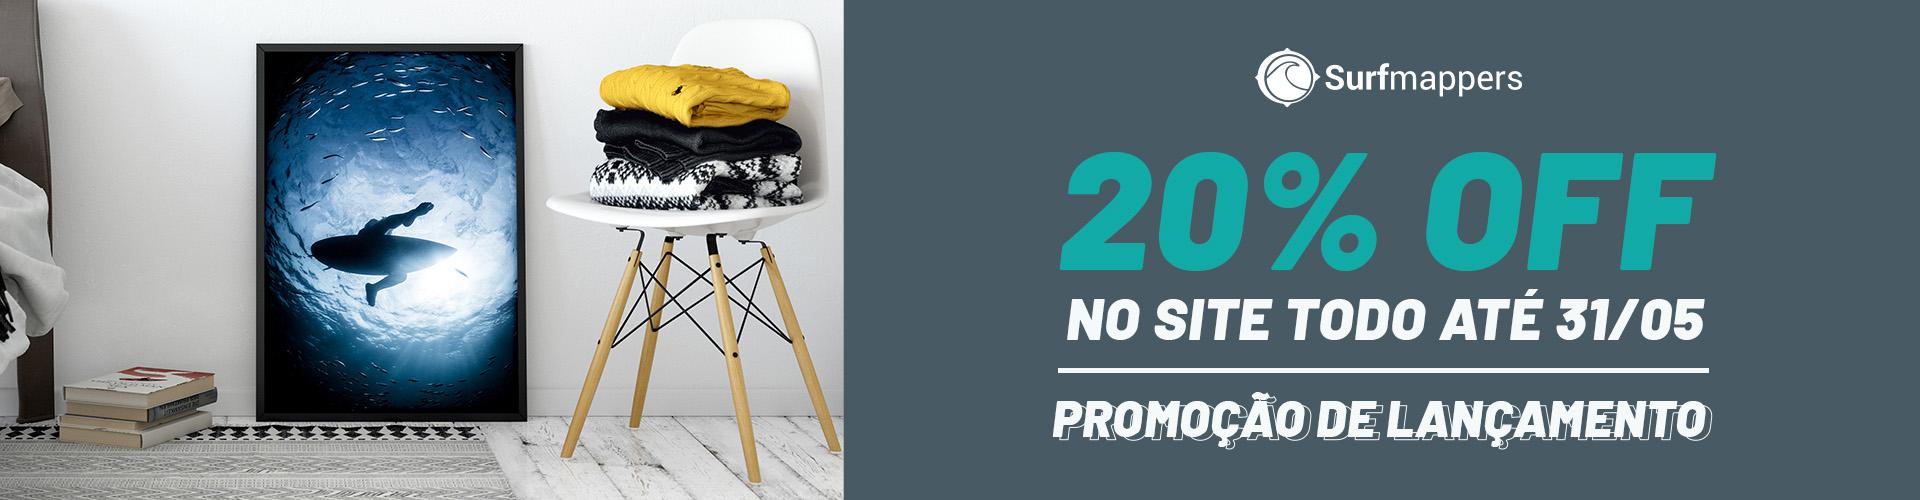 Quadros de Surf - banner promocional